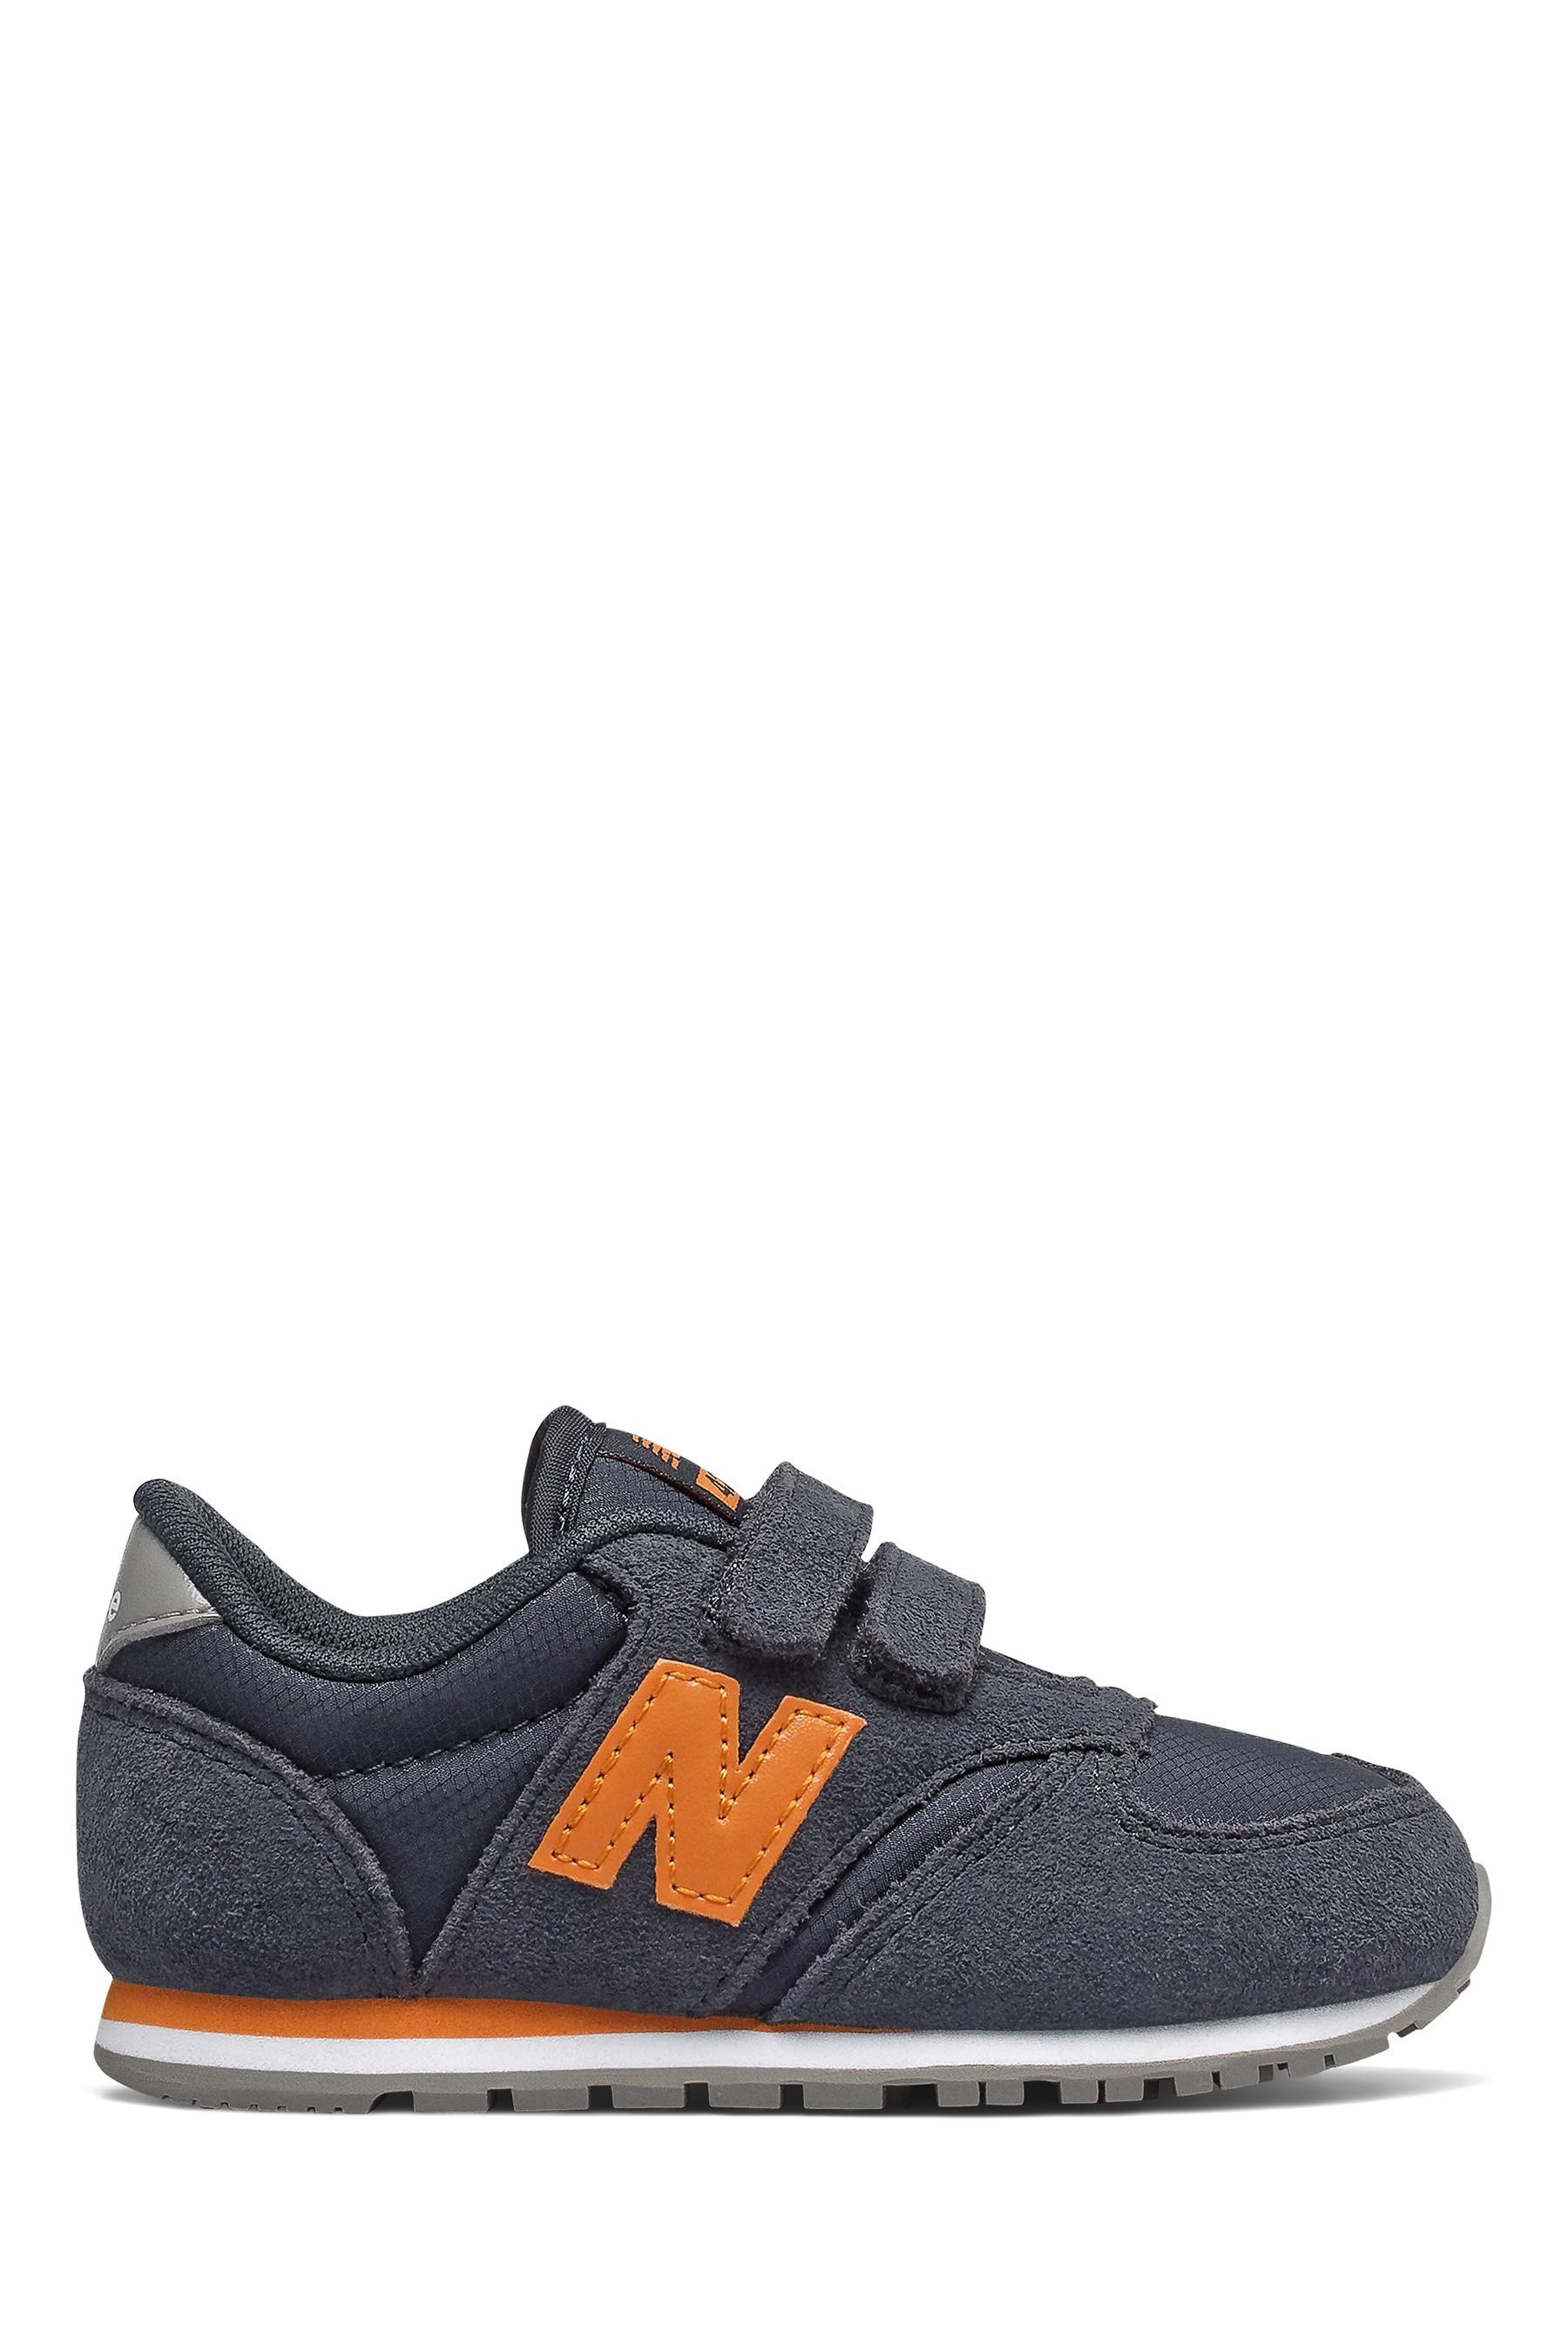 Boys New Balance 420 Infant Trainer